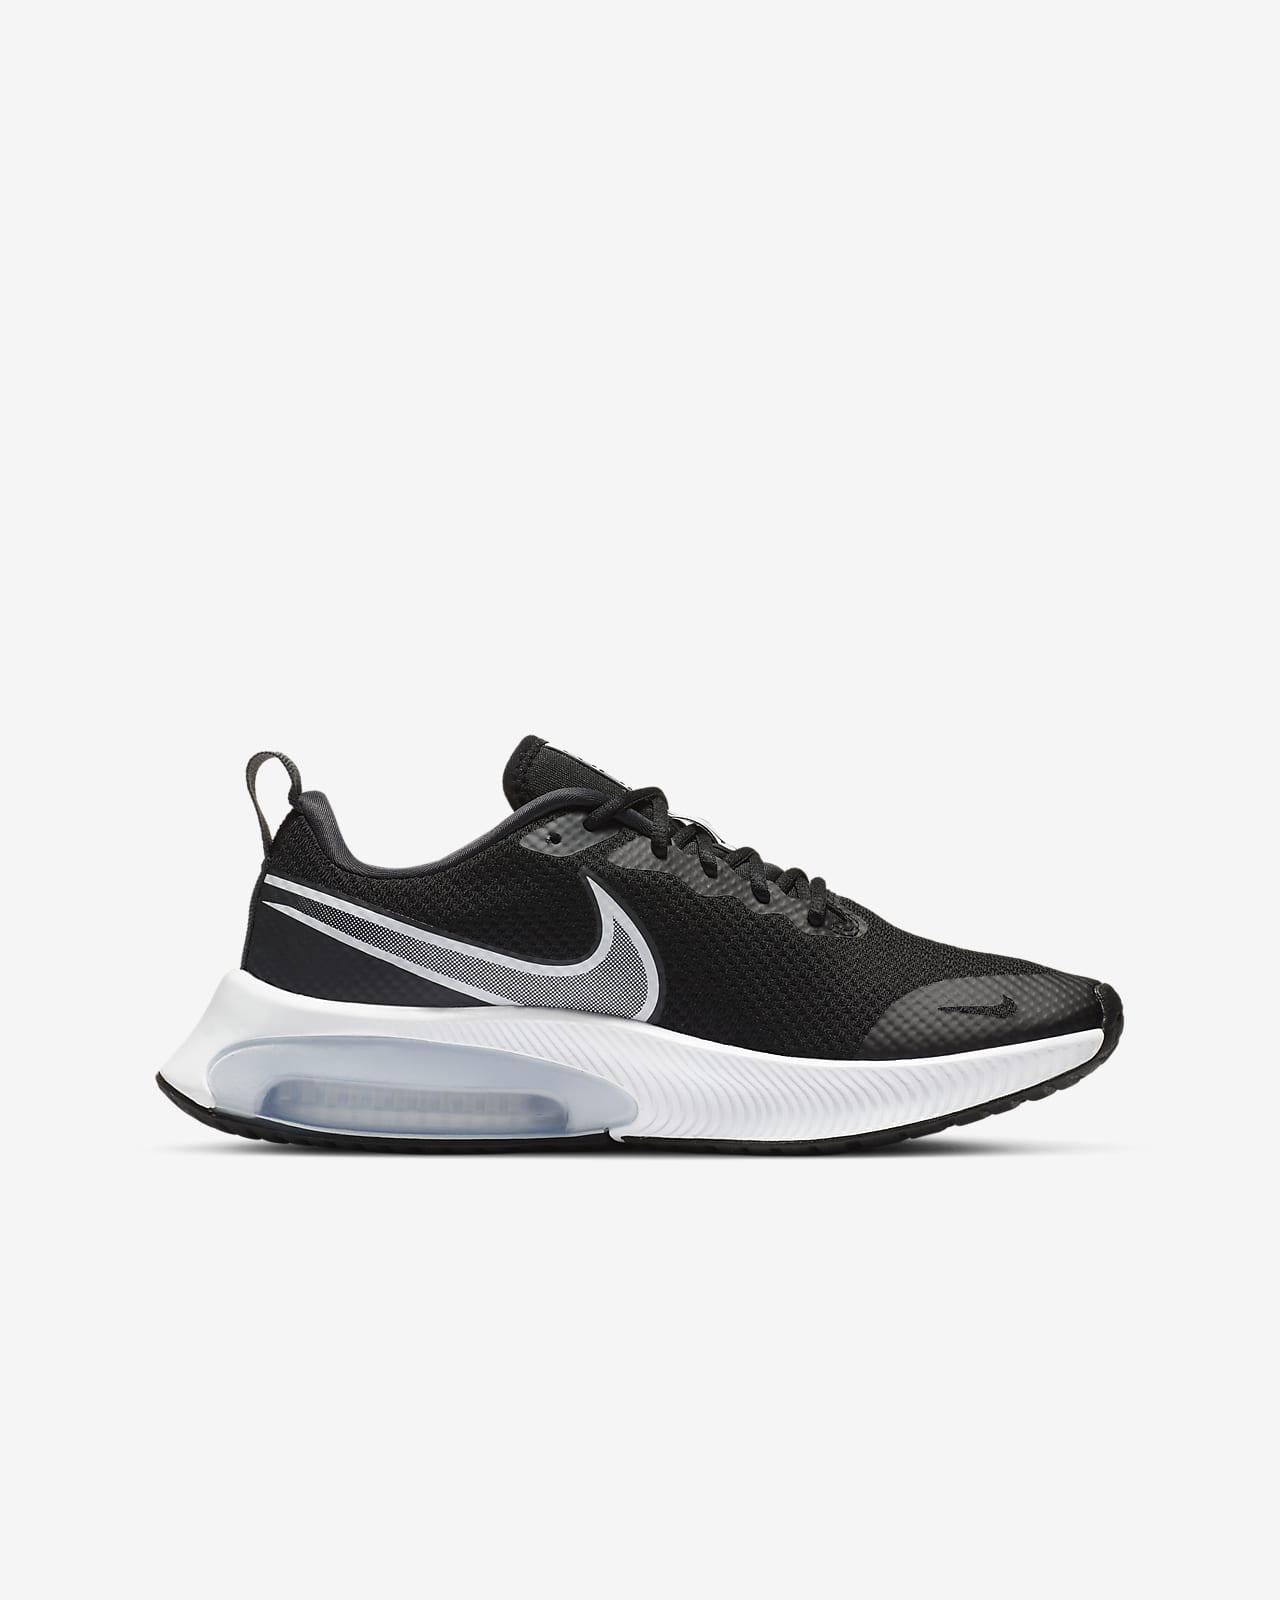 Nike Air Zoom Arcadia Big Kids' Running